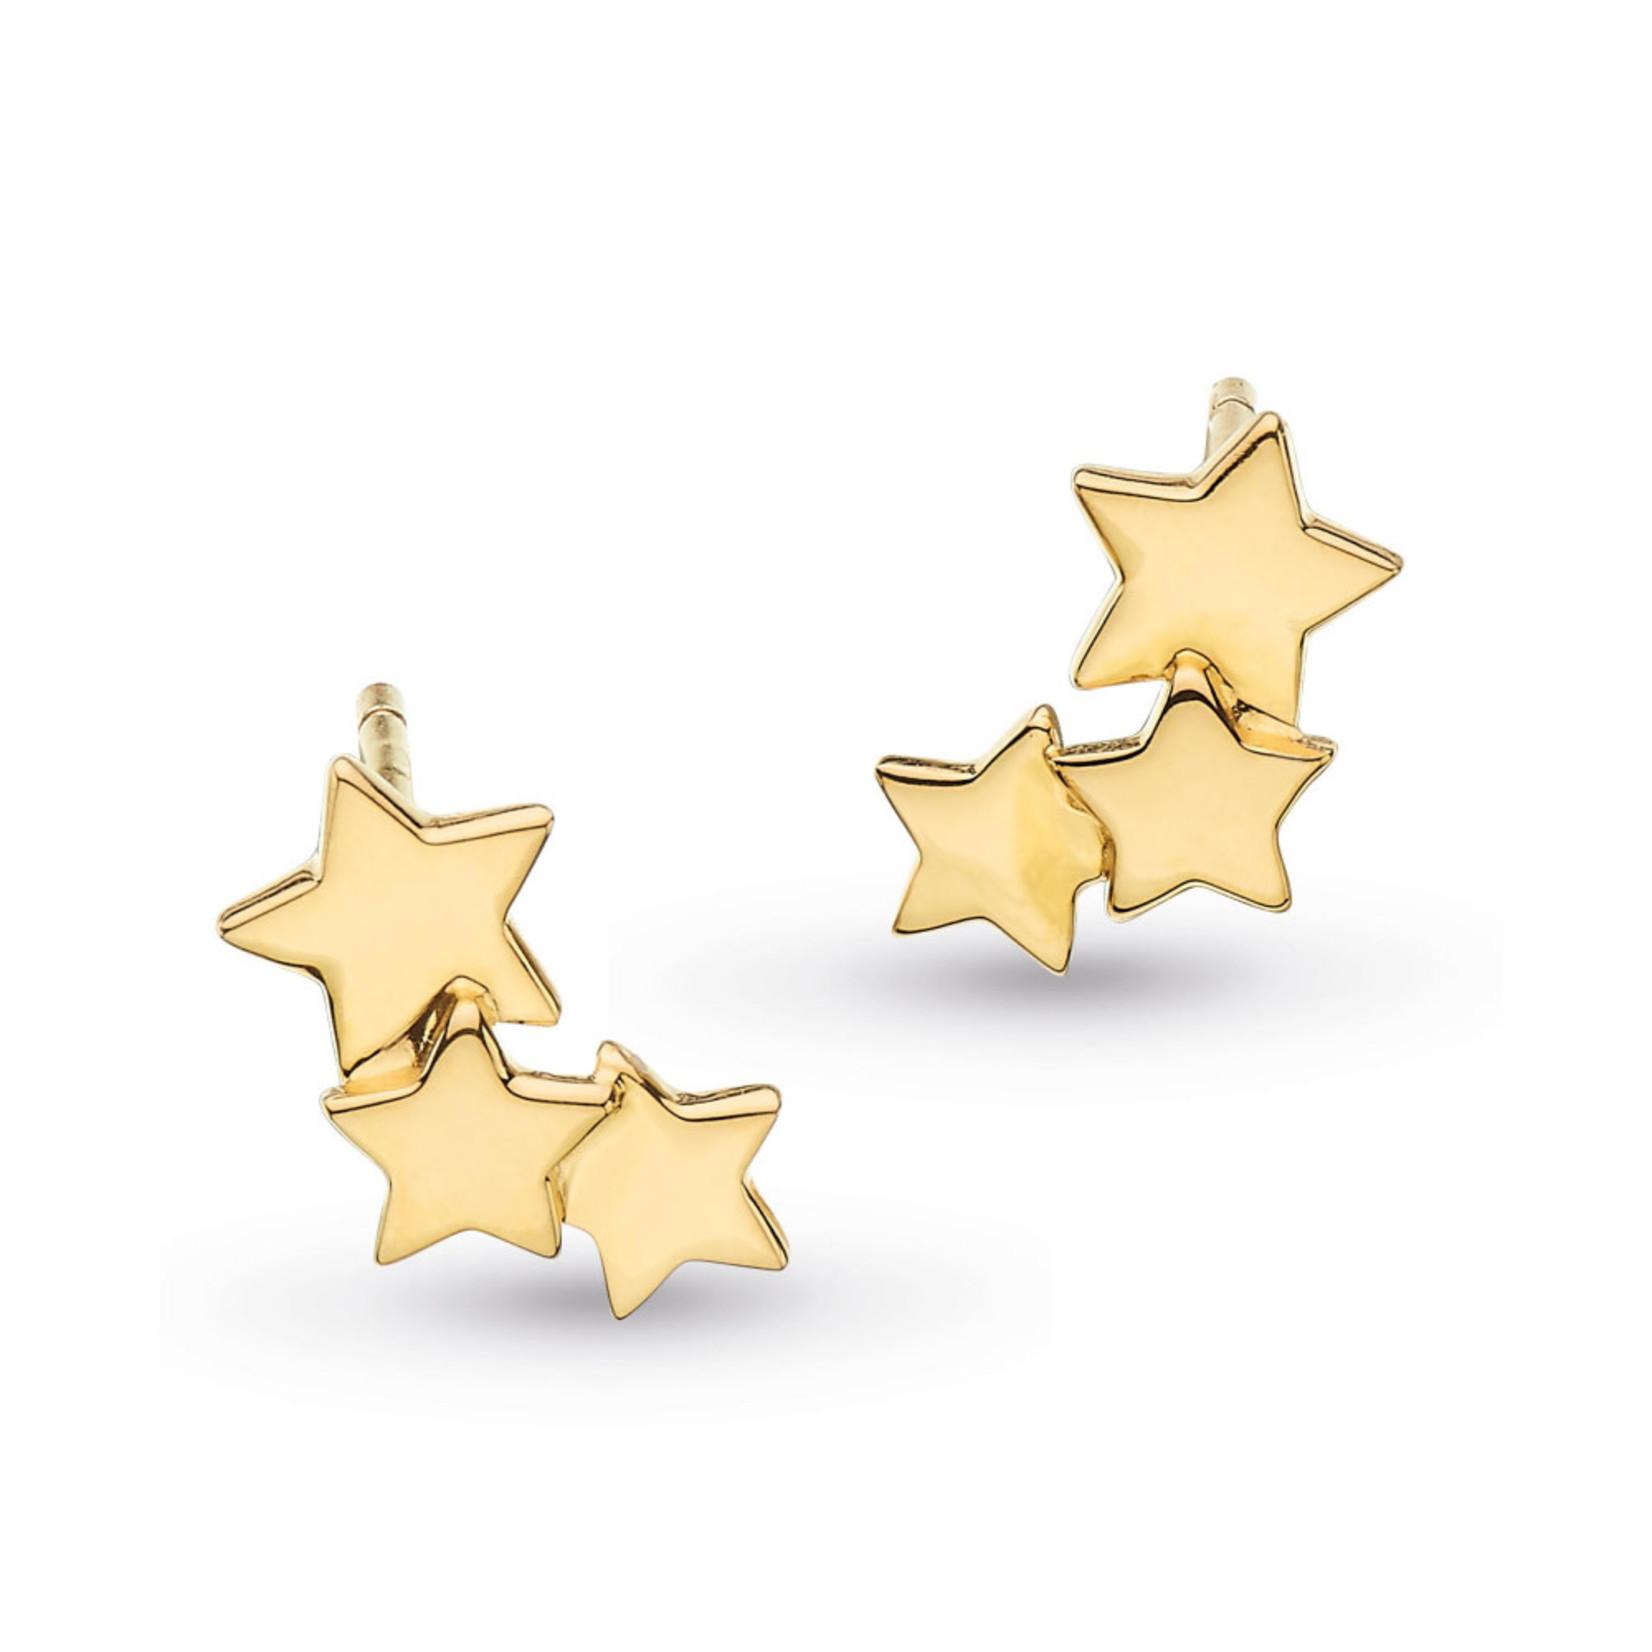 Stargazer Galaxy Studs Gold Plated